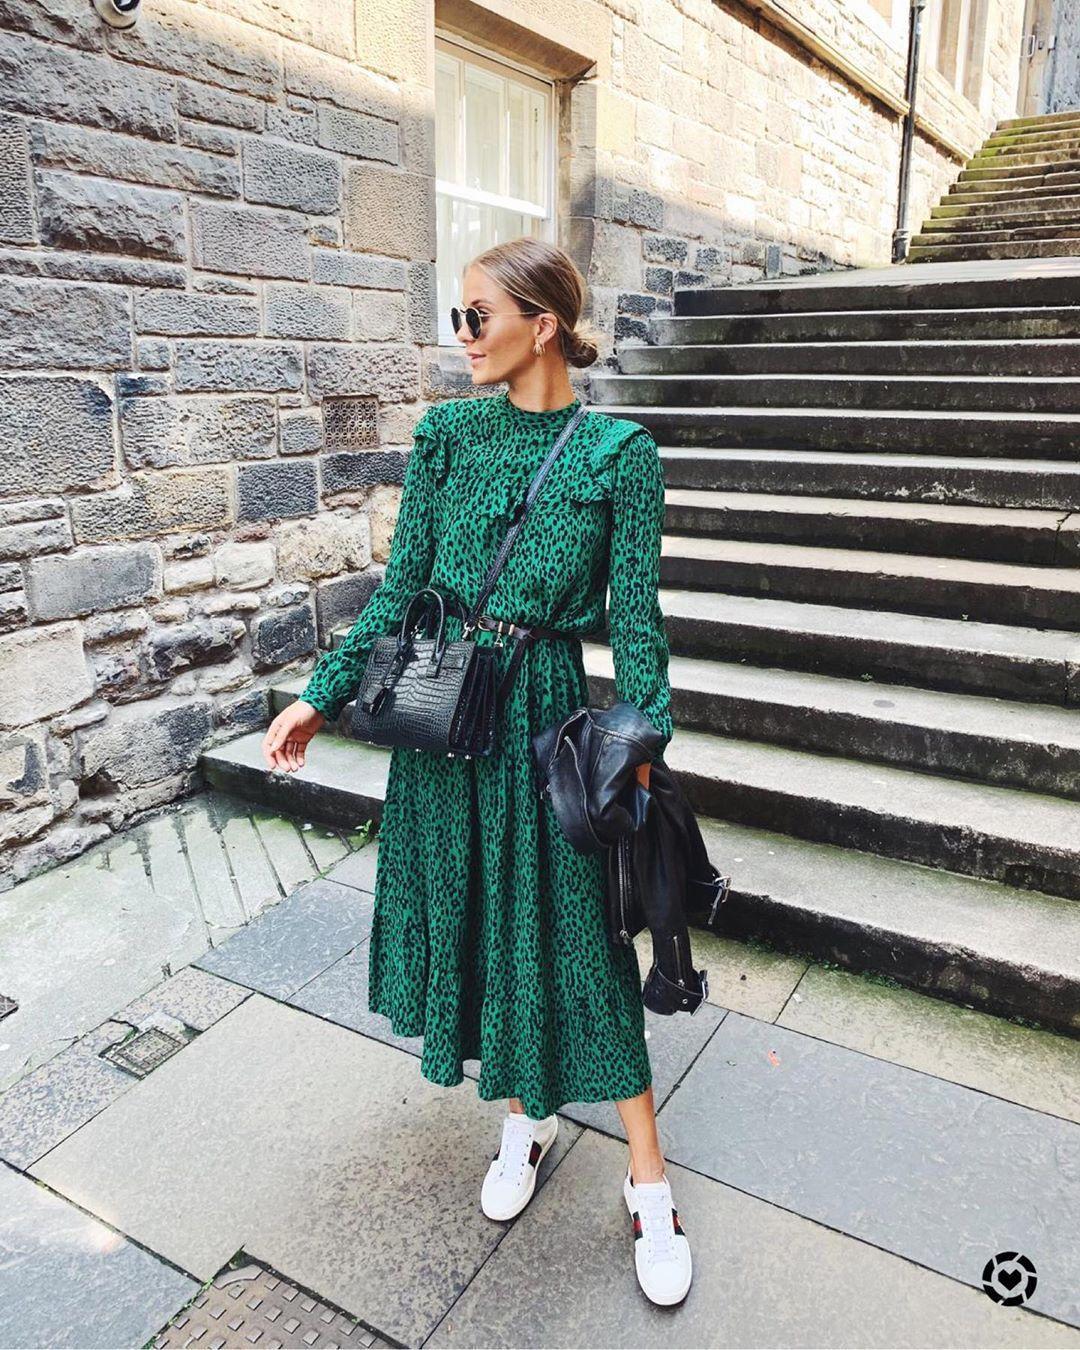 dress midi dress green dress leopard print long sleeve dress white sneakers black bag black leather jacket